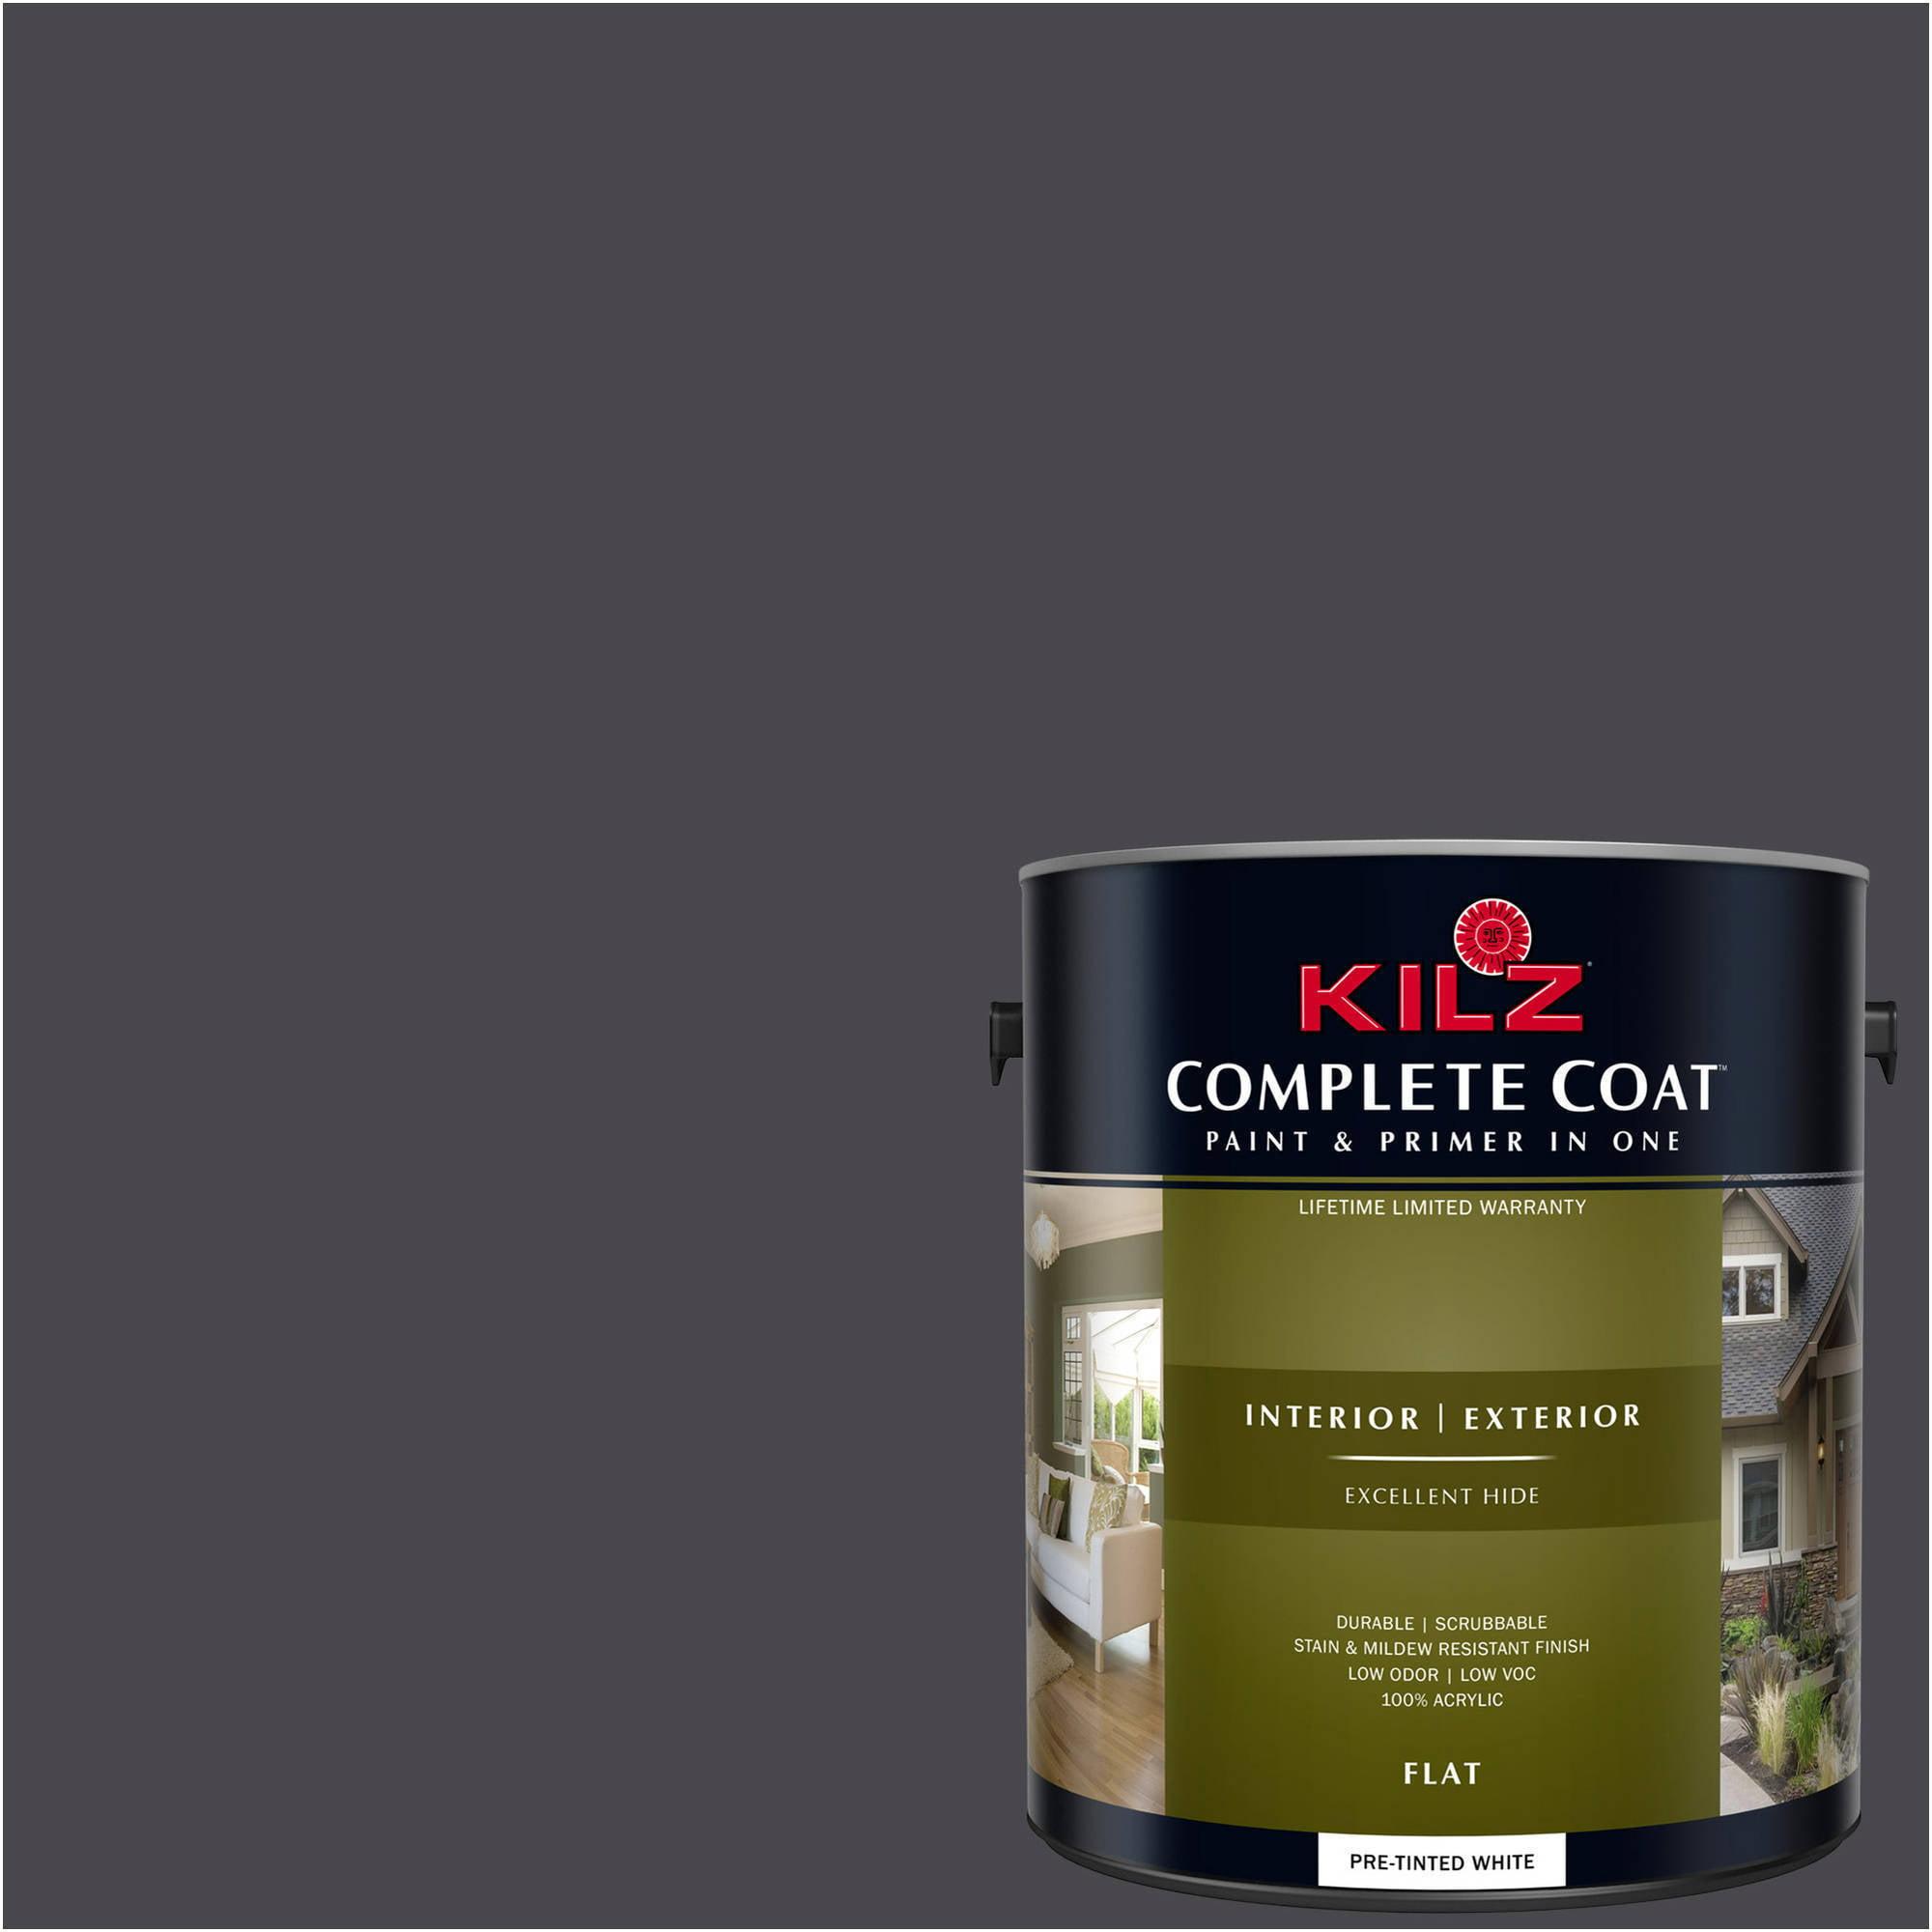 KILZ COMPLETE COAT Interior/Exterior Paint & Primer in One #RM240 Grate Black